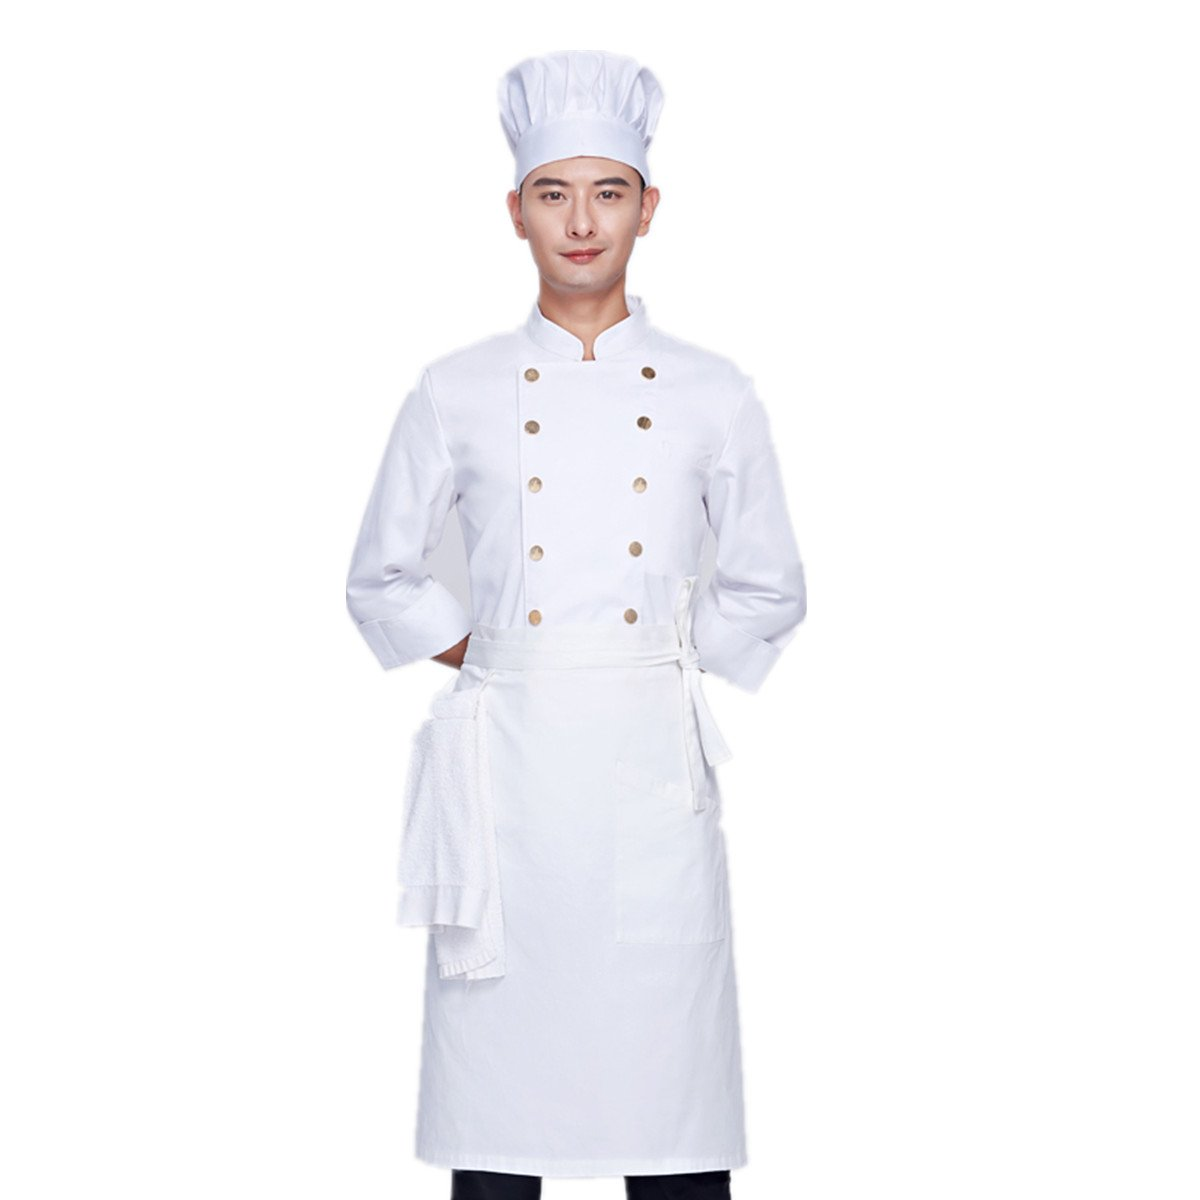 XINFU Unisex Chef's Uniform Long Sleeve Pure Cotton Chef Coat Restaurant Men Women Kitchen White Coat With Apron Hat